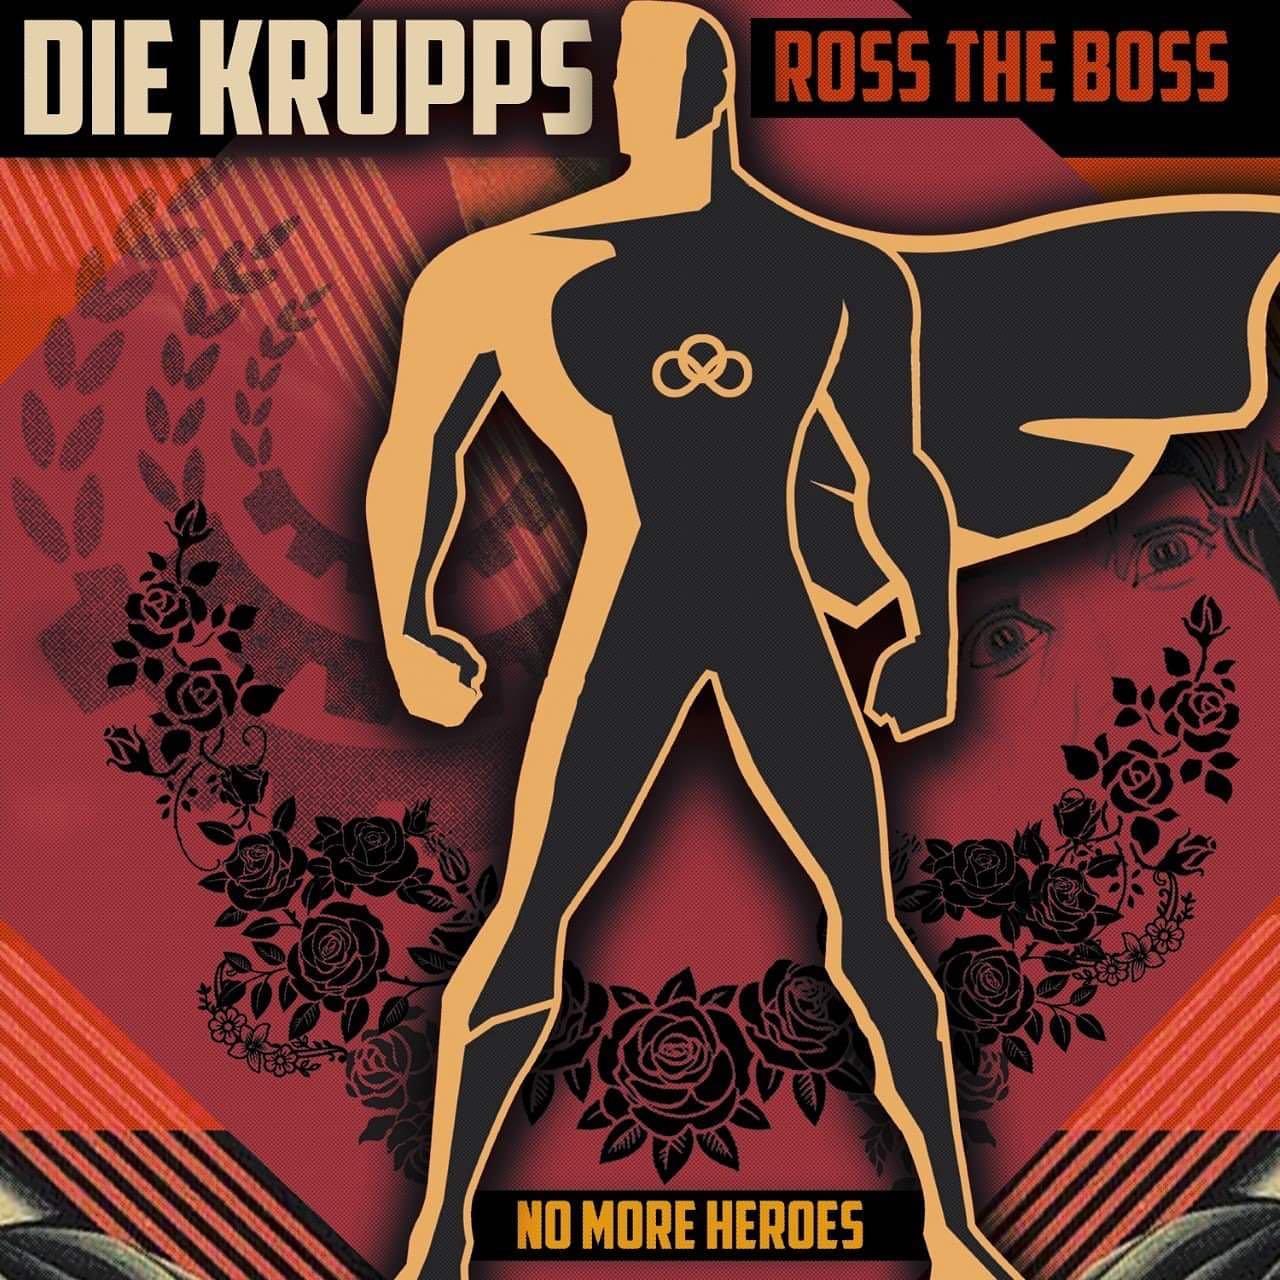 DIE KRUPPS et Ross The Boss no more heroes